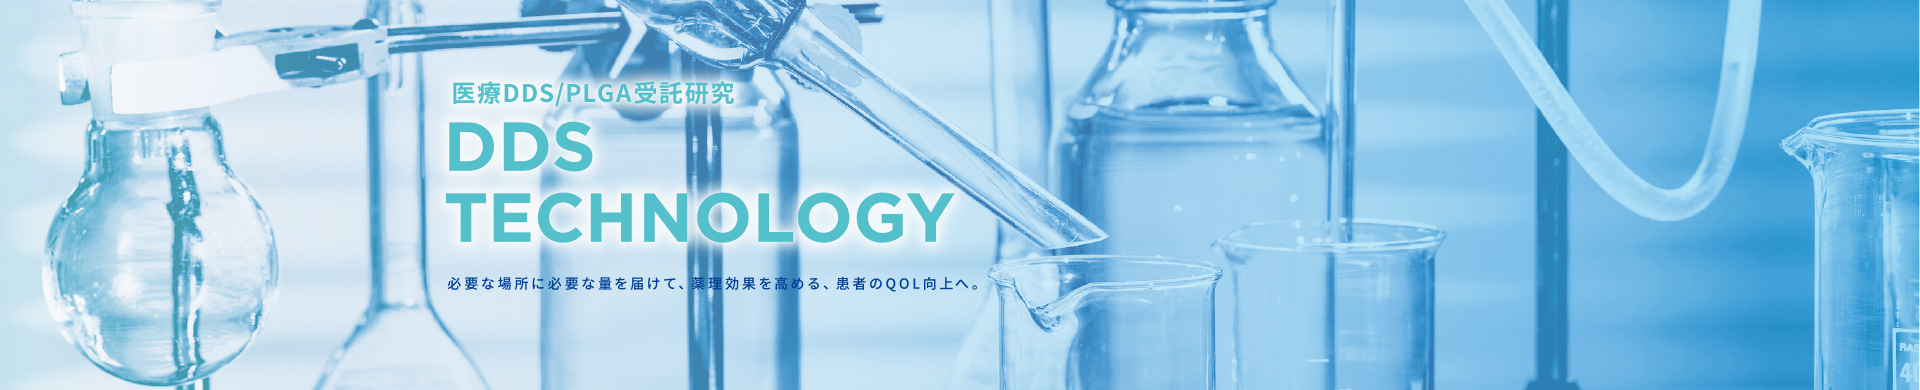 DDS TECHNOLOGY ホソカワミクロン株式会社 マテリアル事業本部 Hosokawa Micron